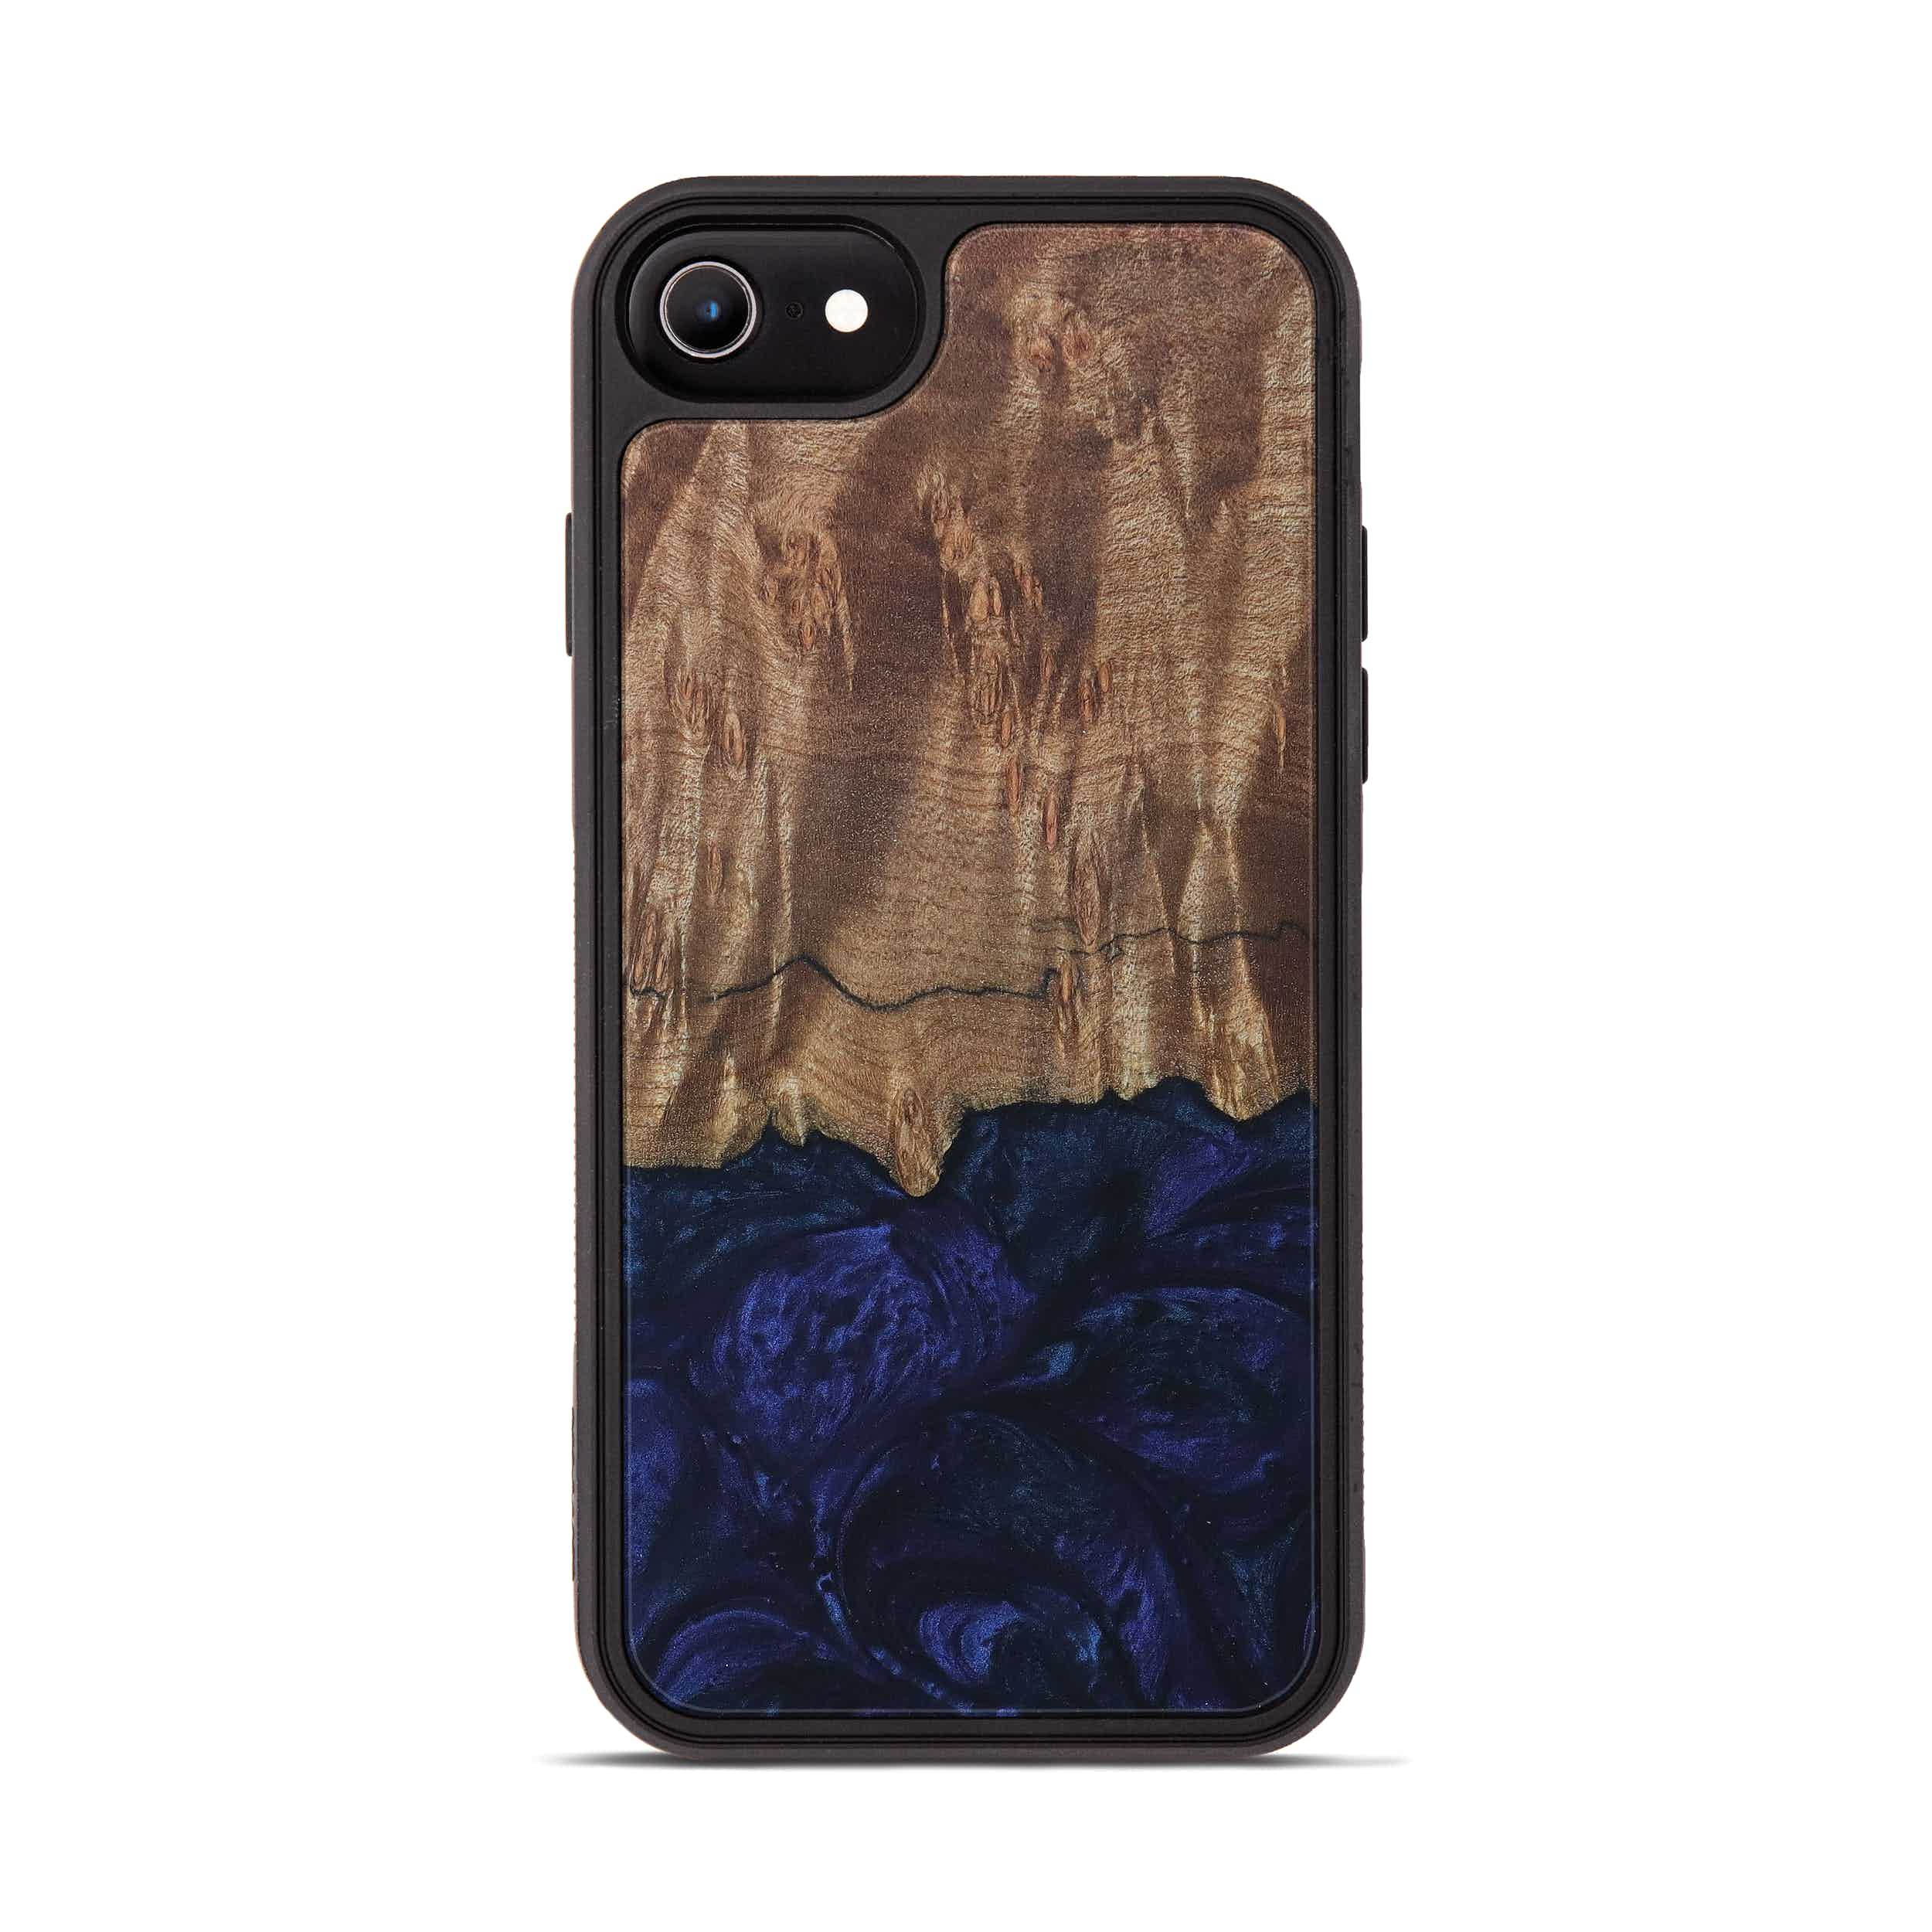 iPhone 7 Wood+Resin Phone Case - Caitrin (Dark Blue, 399636)